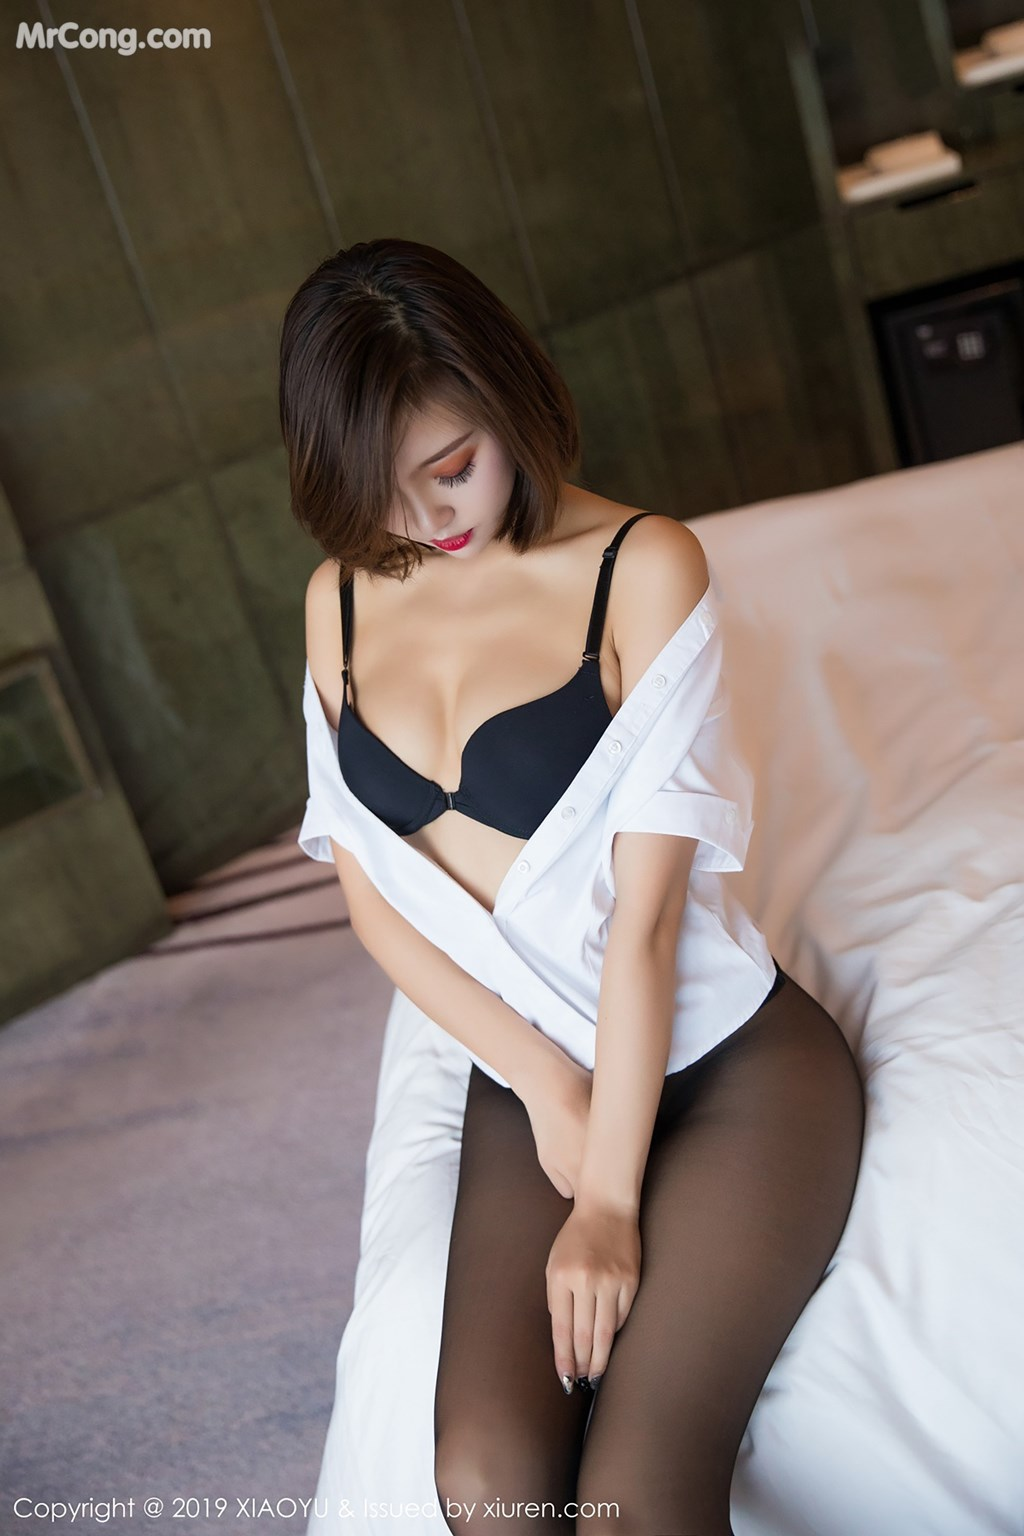 Image XiaoYu-Vol.032-LRIS-Feng-Mu-Mu-MrCong.com-007 in post XiaoYu Vol.032: Người mẫu LRIS (冯木木) (62 ảnh)